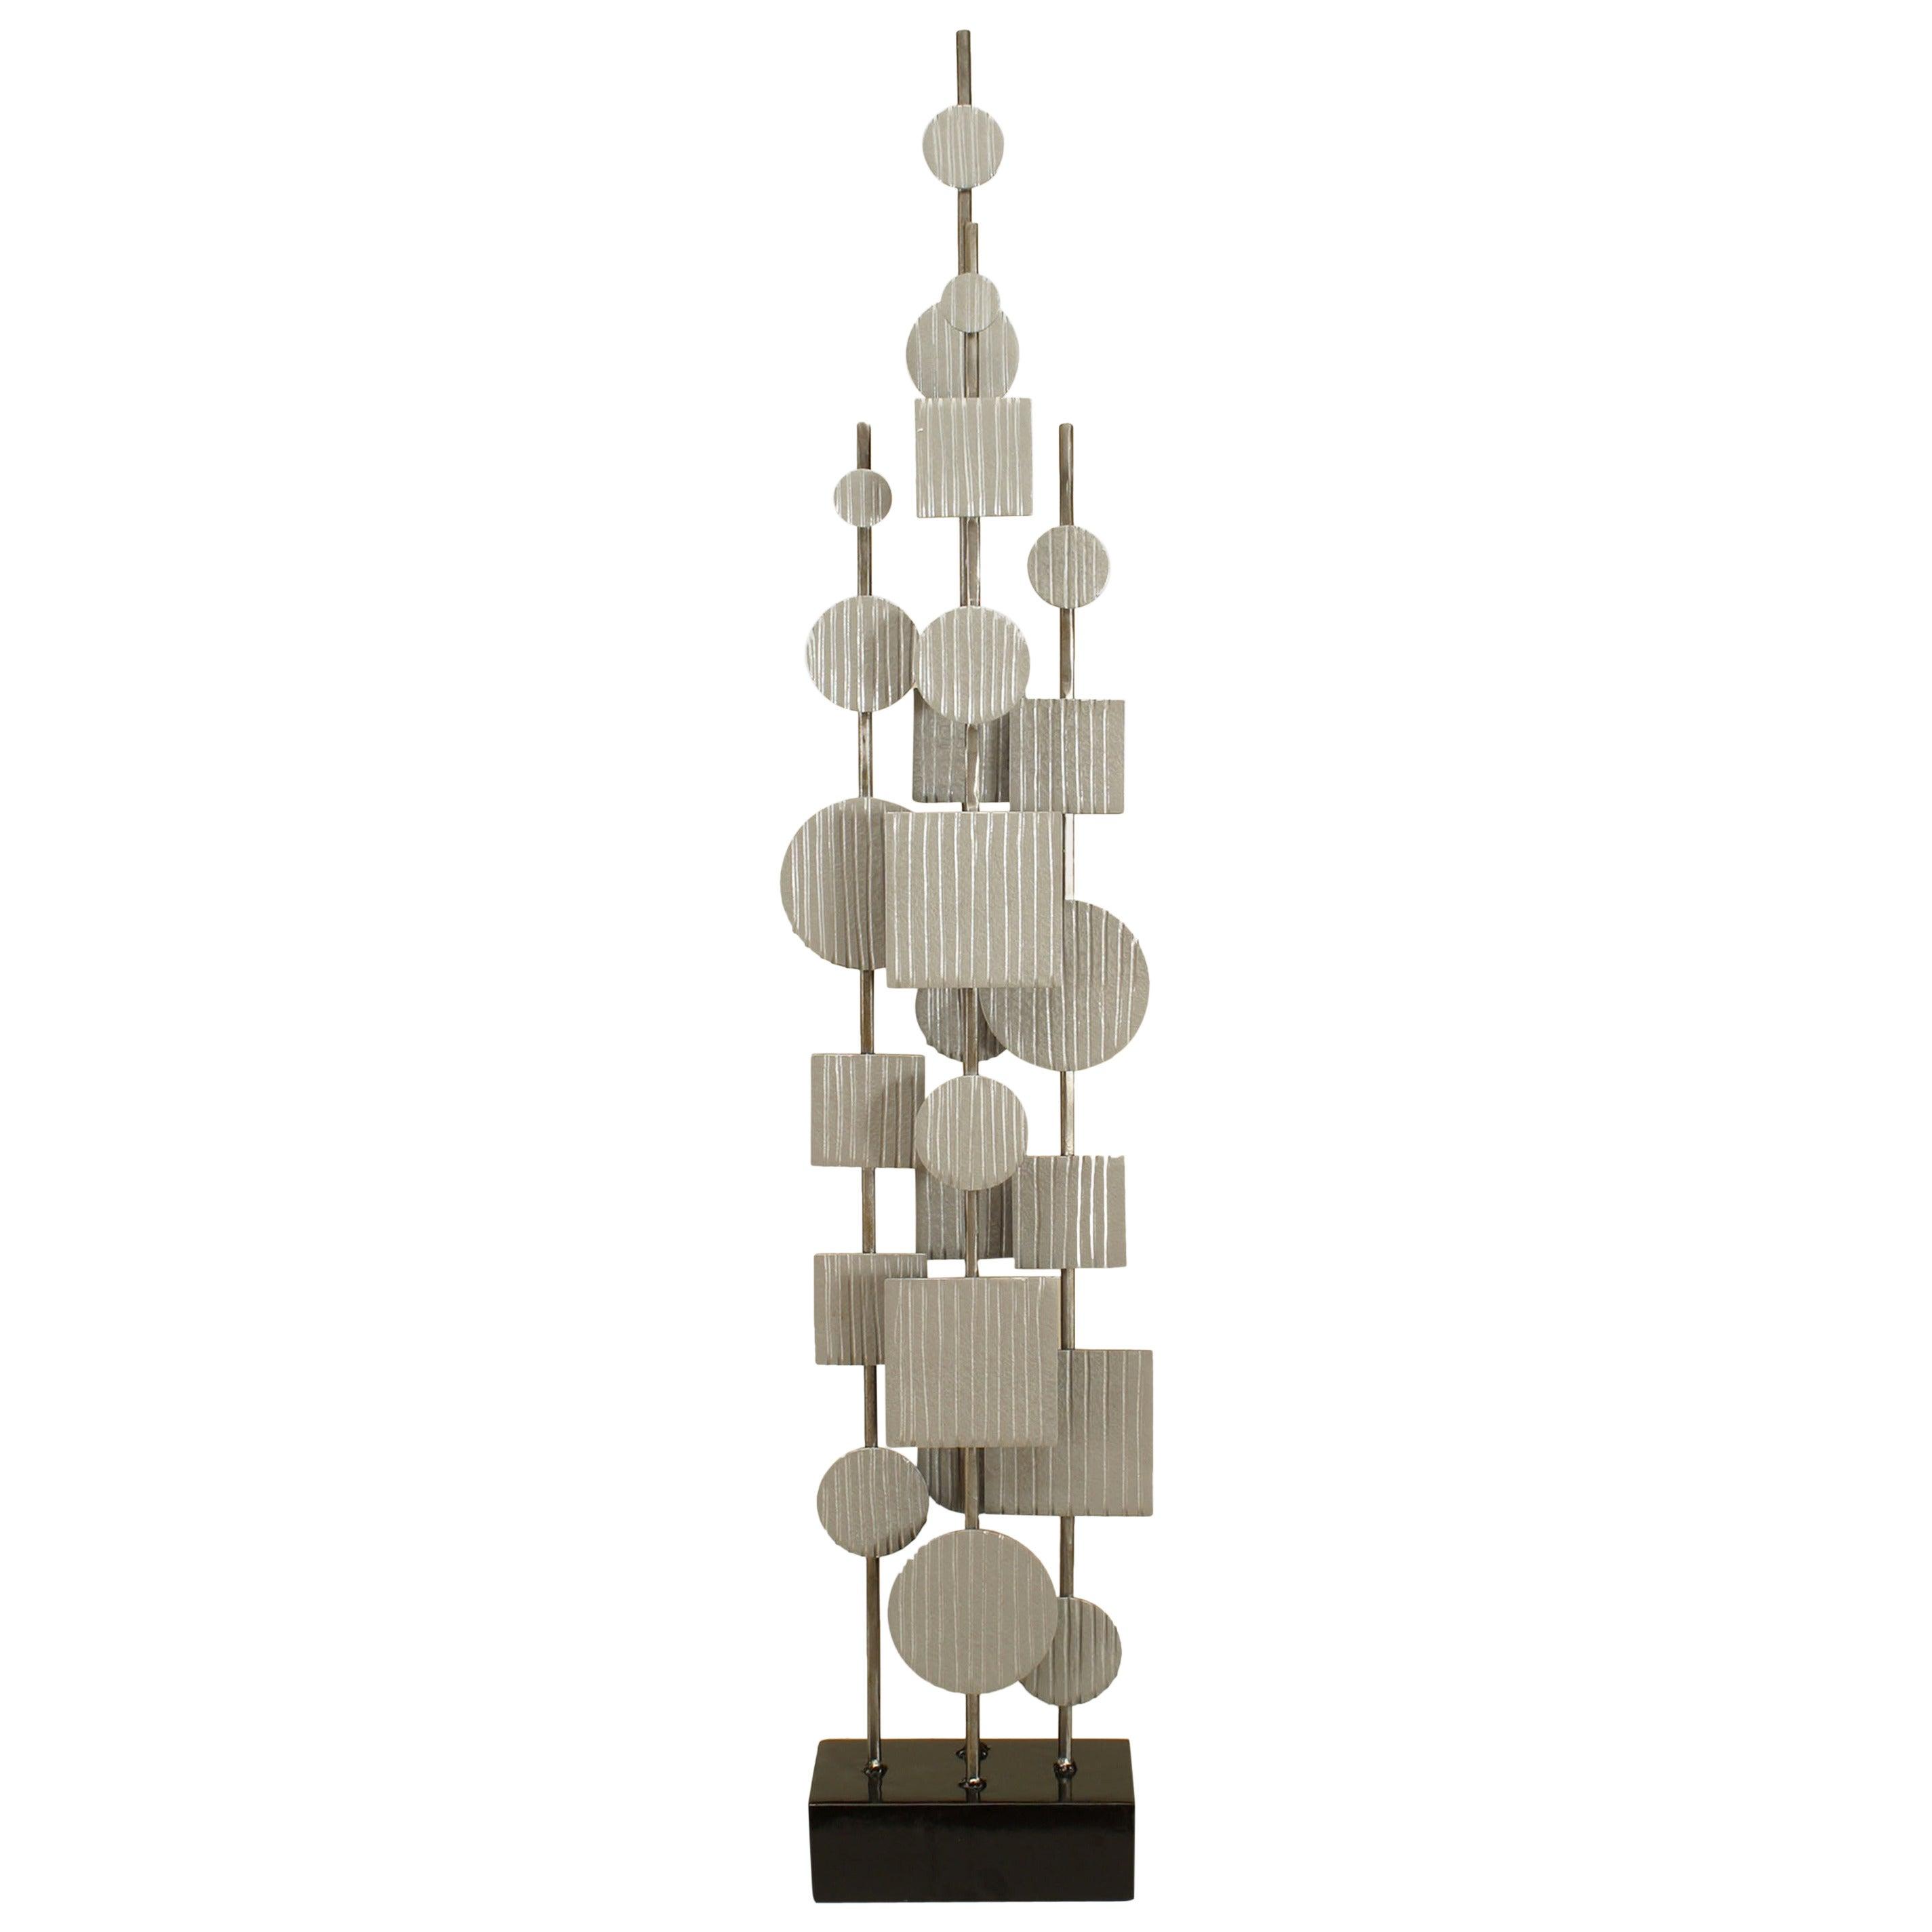 American Post-War Abstract Steel Sculpture